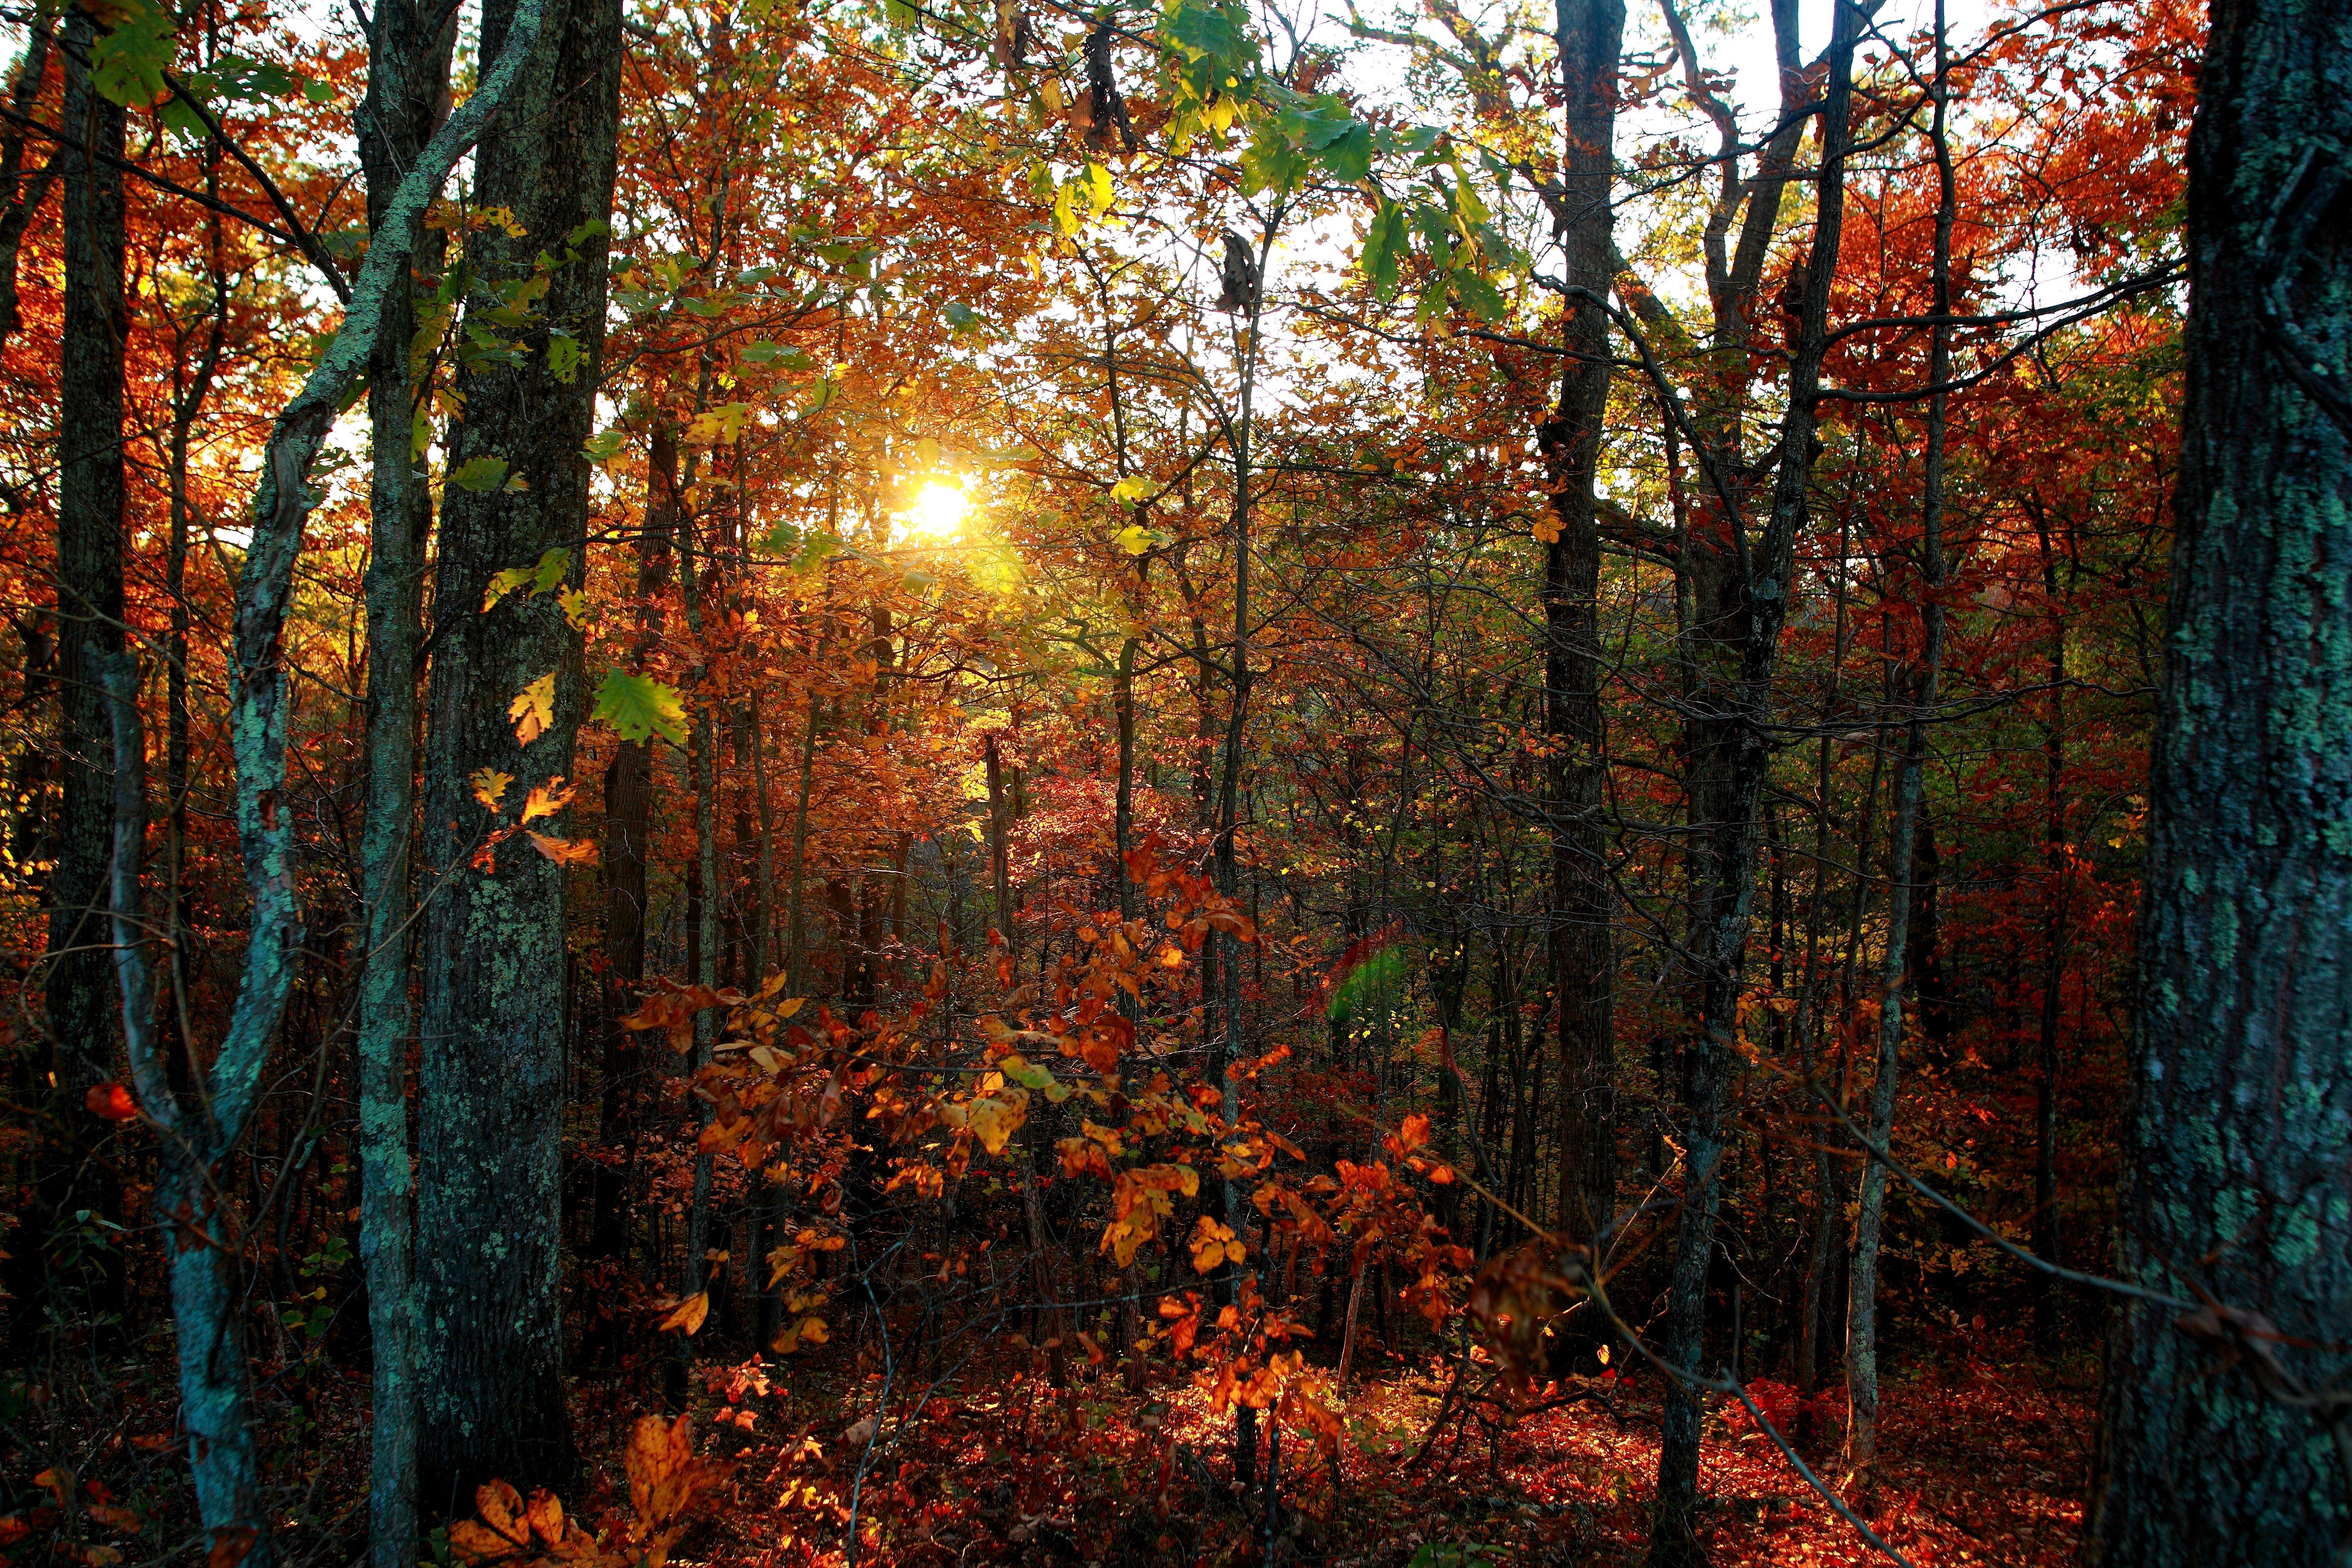 Ficheiro Autumn Trees Leaves Foliage Sunset West Virginia Forestwander Jpg Wikipedia A Enciclopedia Livre